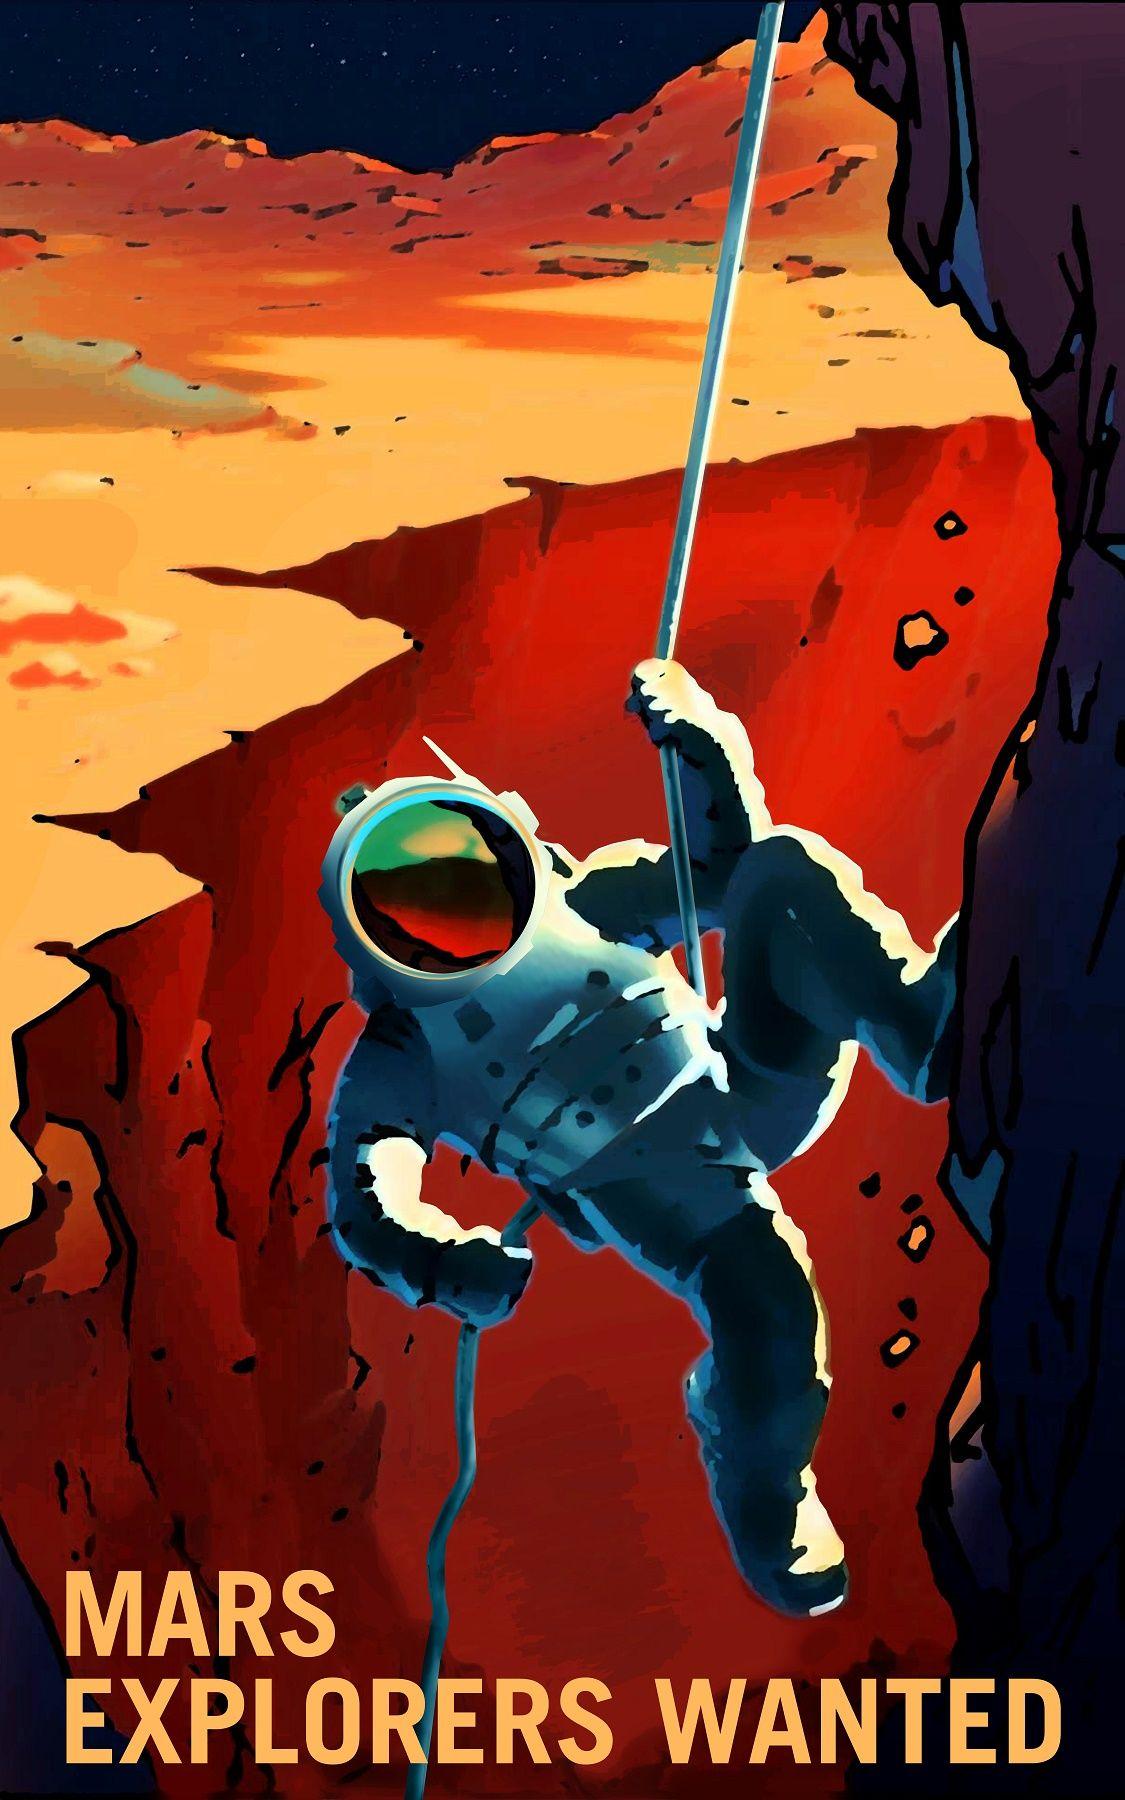 nasa mars exploration poster